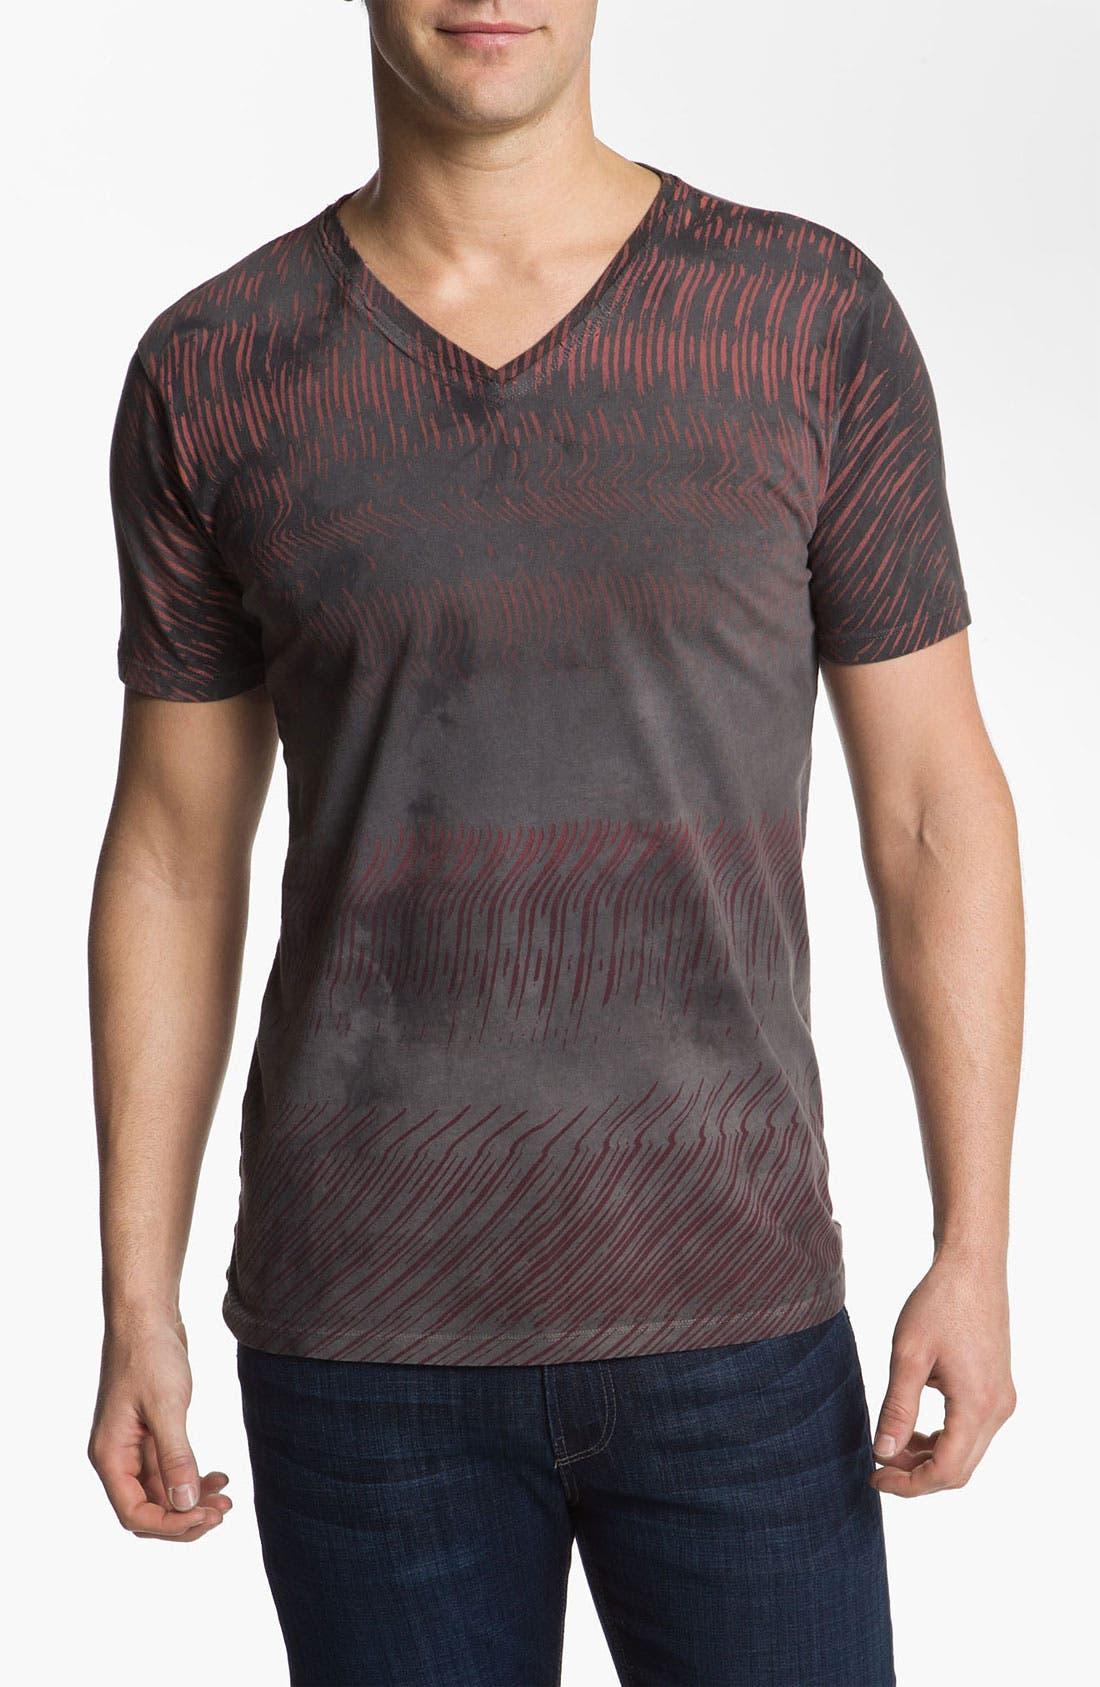 Main Image - Black Hearts Brigade 'Wave Length' Graphic T-Shirt